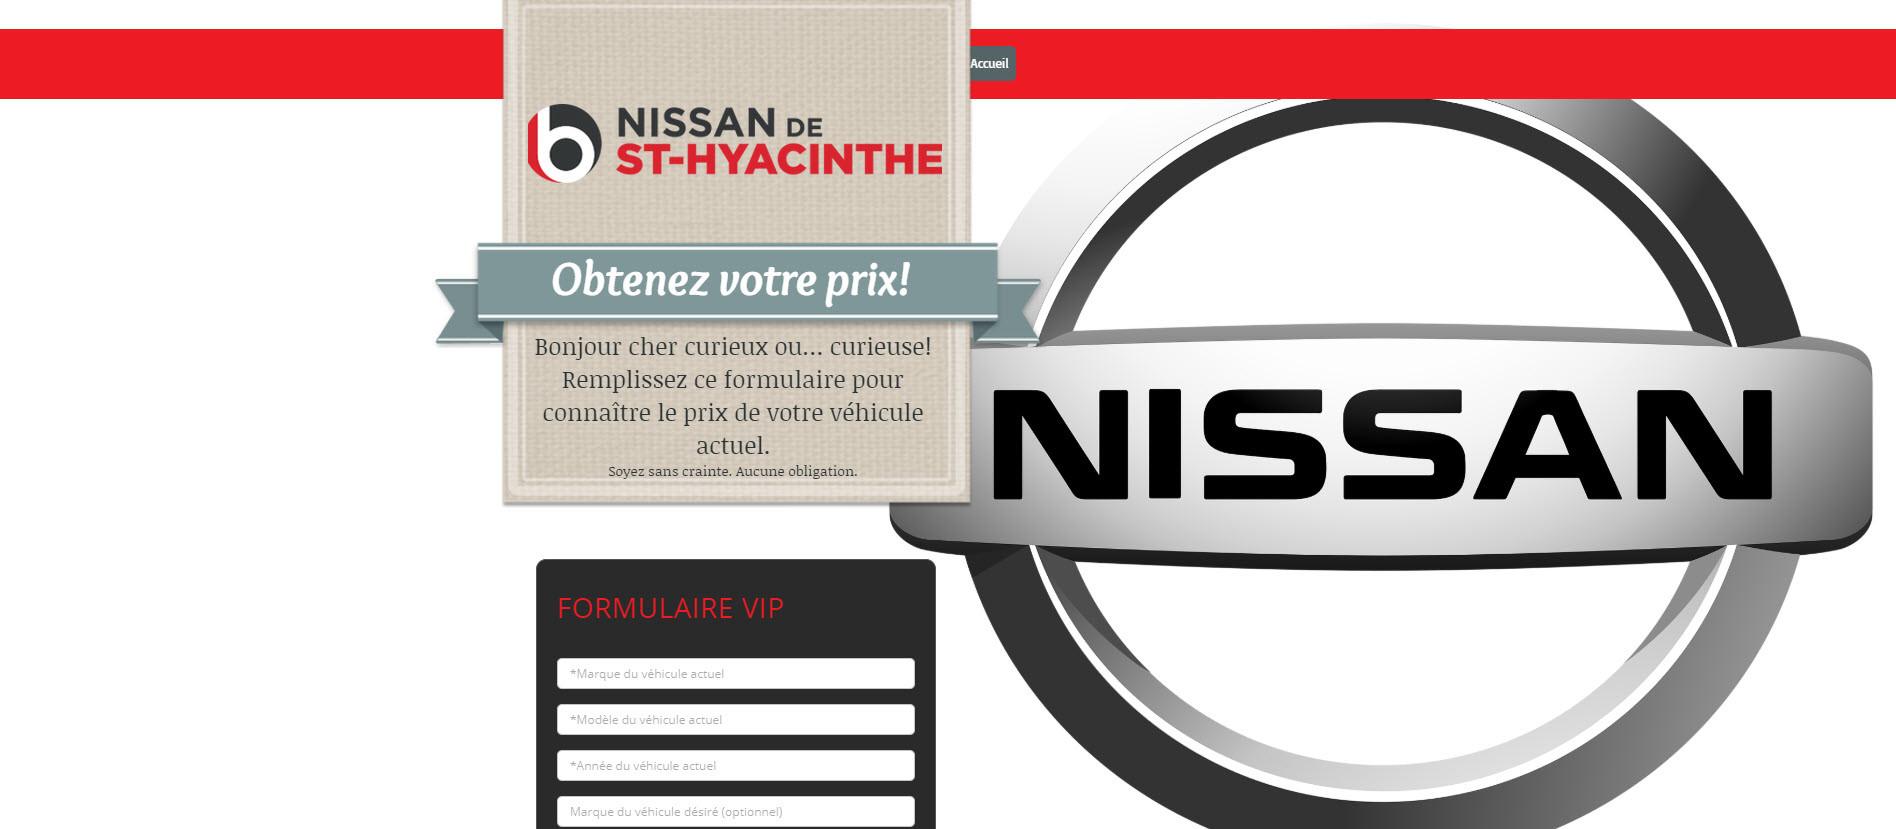 Landing. Nissan de Saint-Hyacinthe